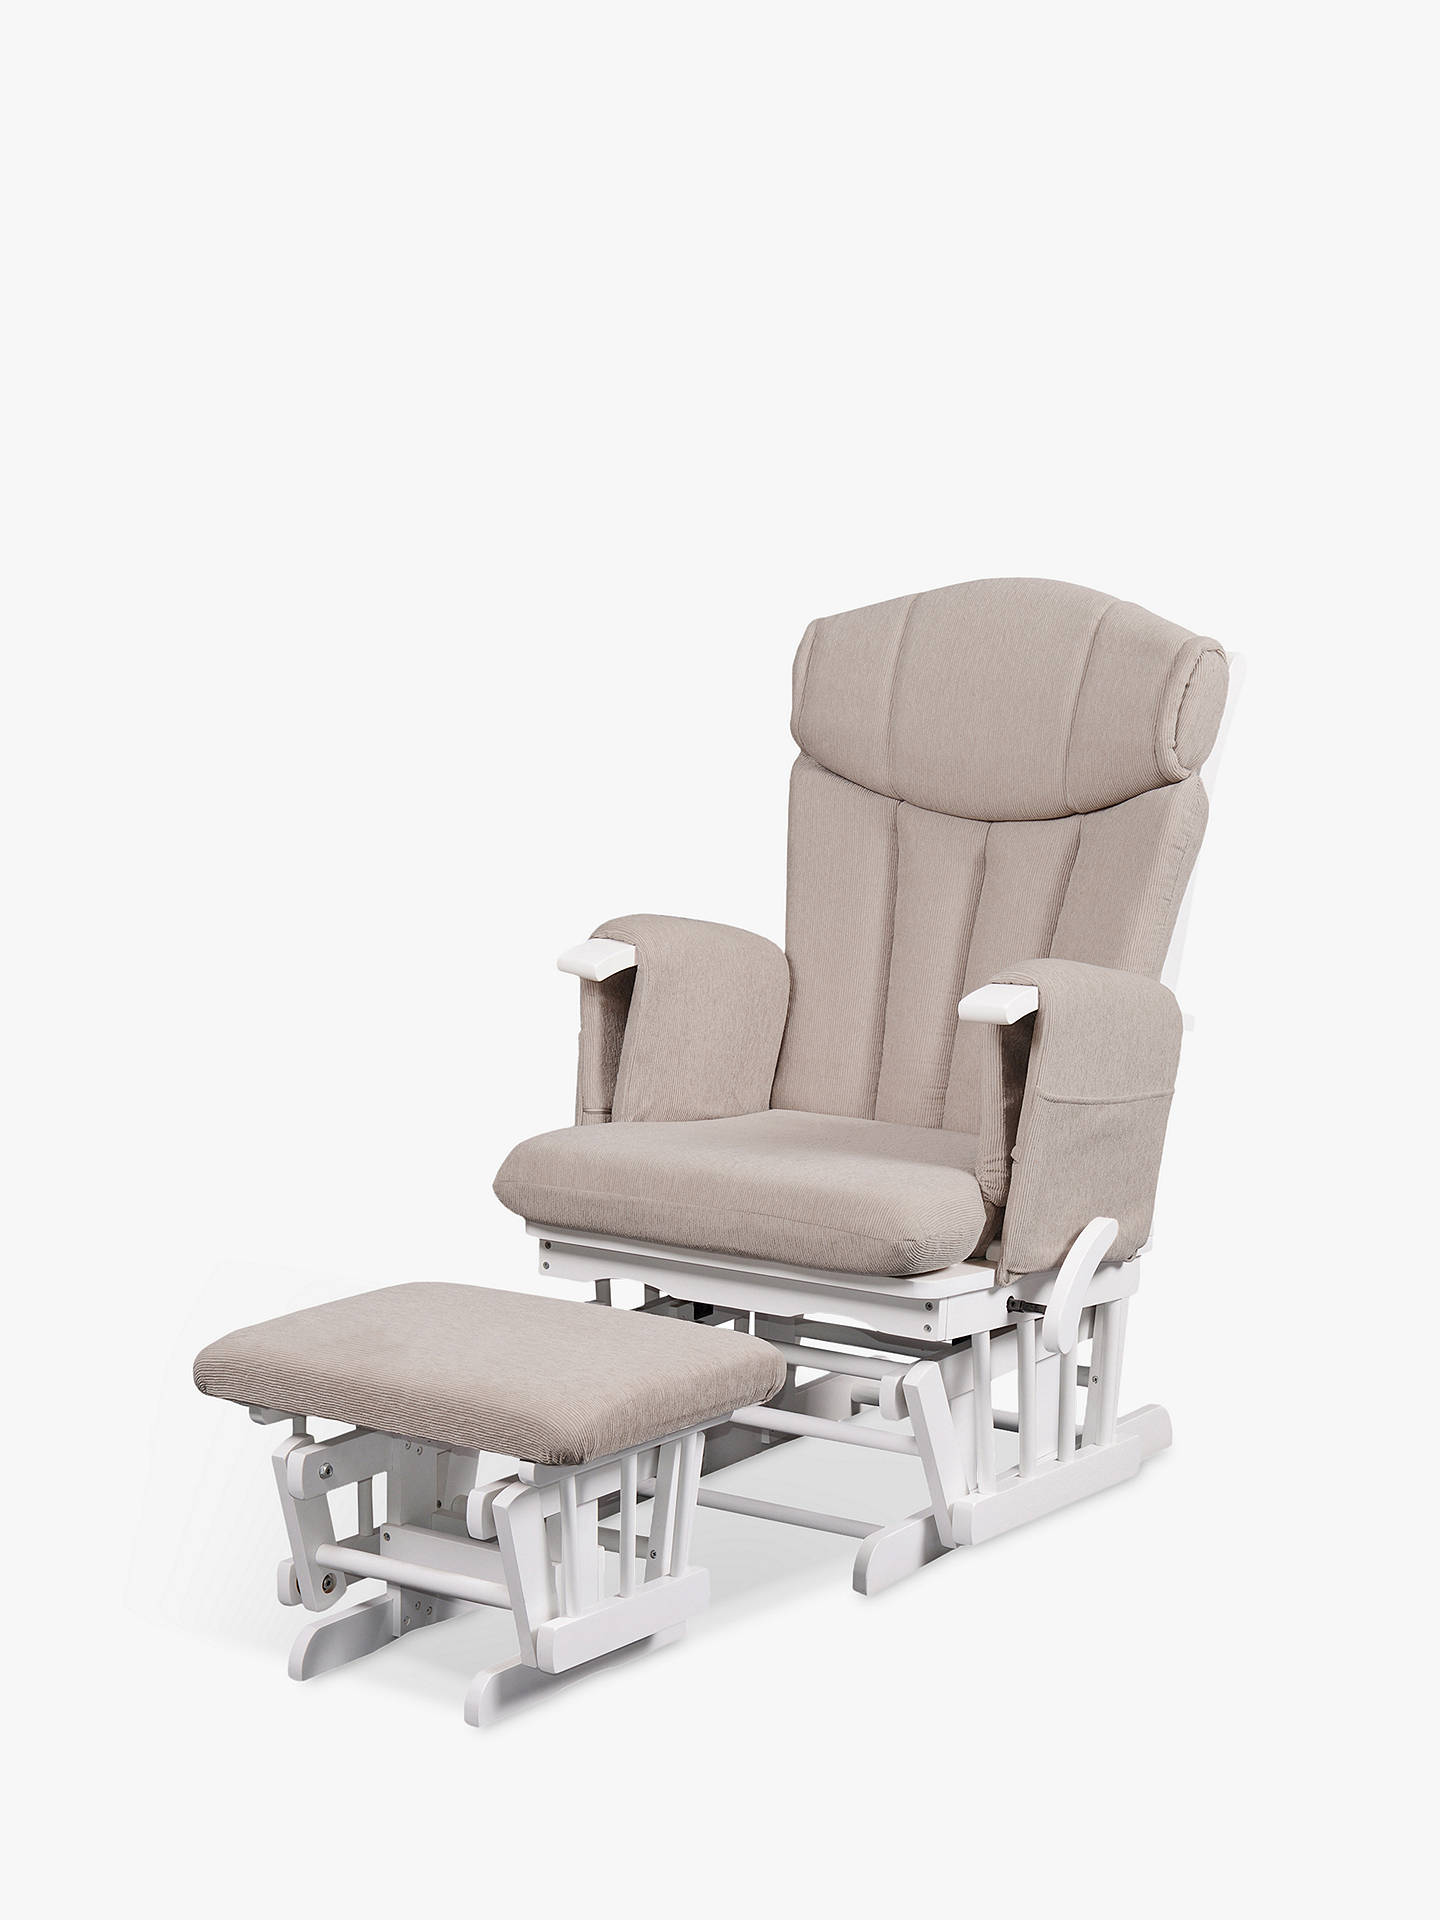 Kub Chatsworth Glider Nursing Chair Cucino